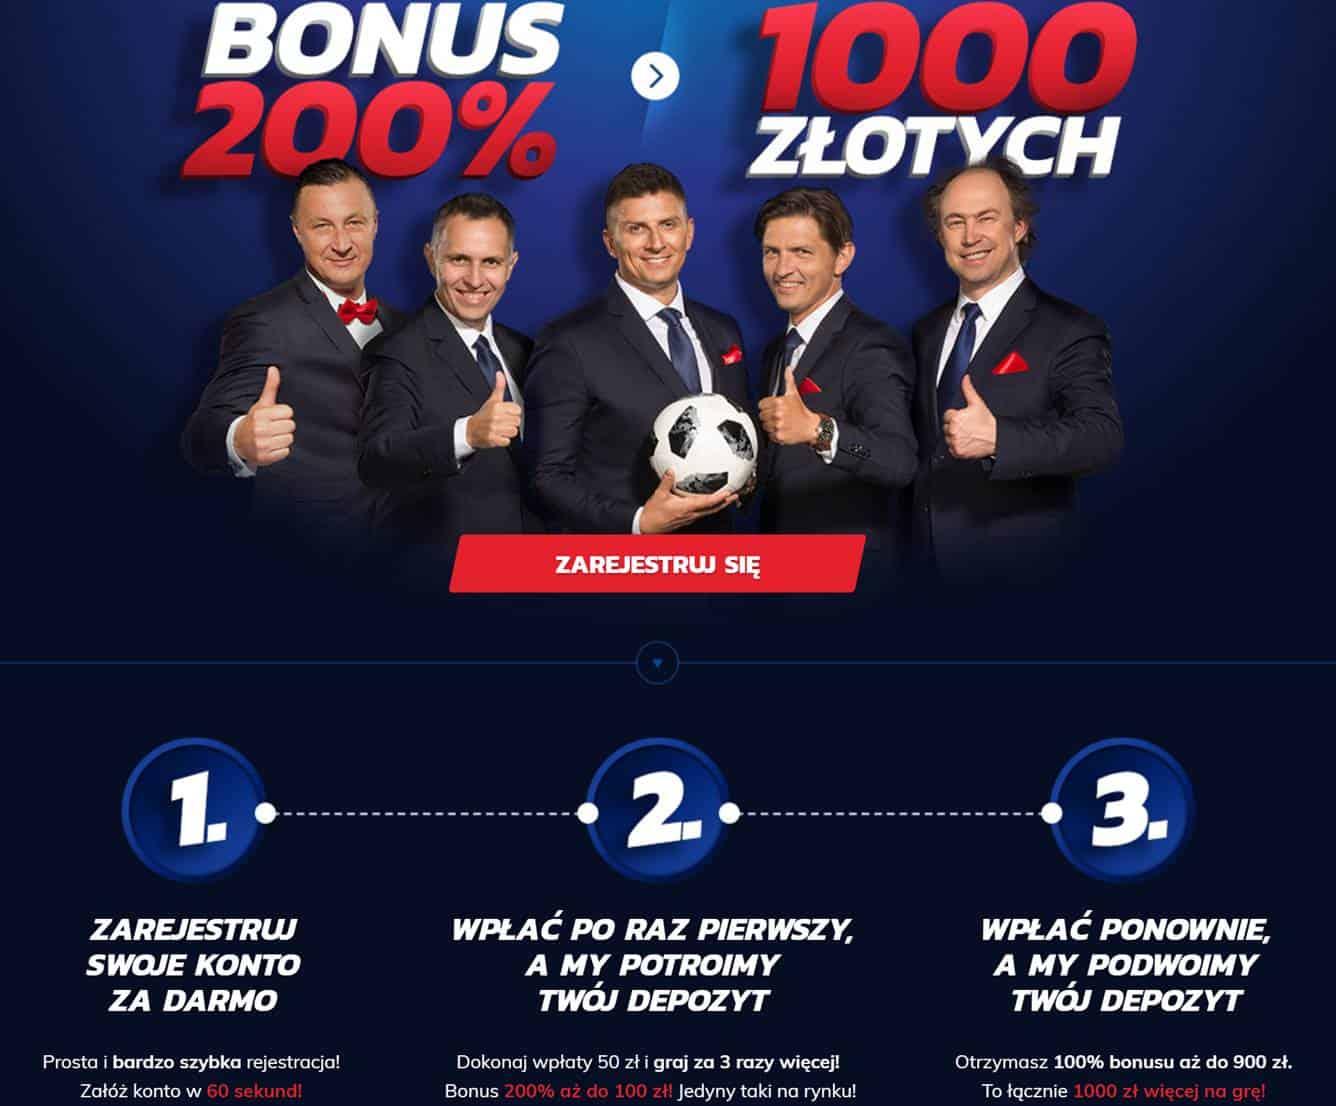 Nowy bonus powitalny Etoto. 200% do 1000 PLN!Nowy bonus powitalny Etoto. 200% do 1000 PLN!